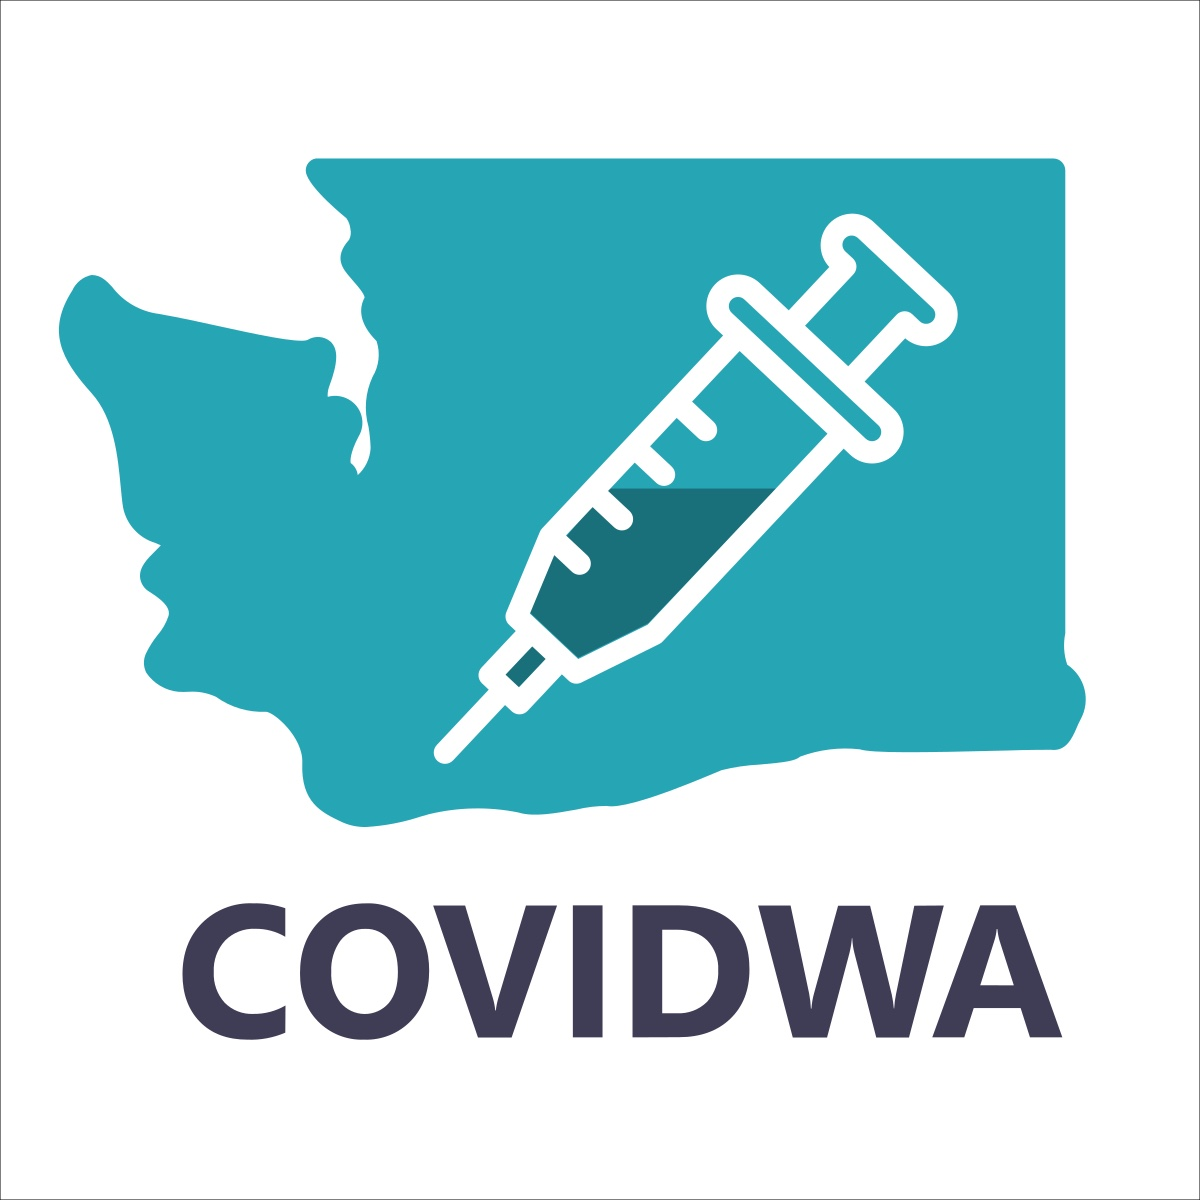 www.covidwa.com